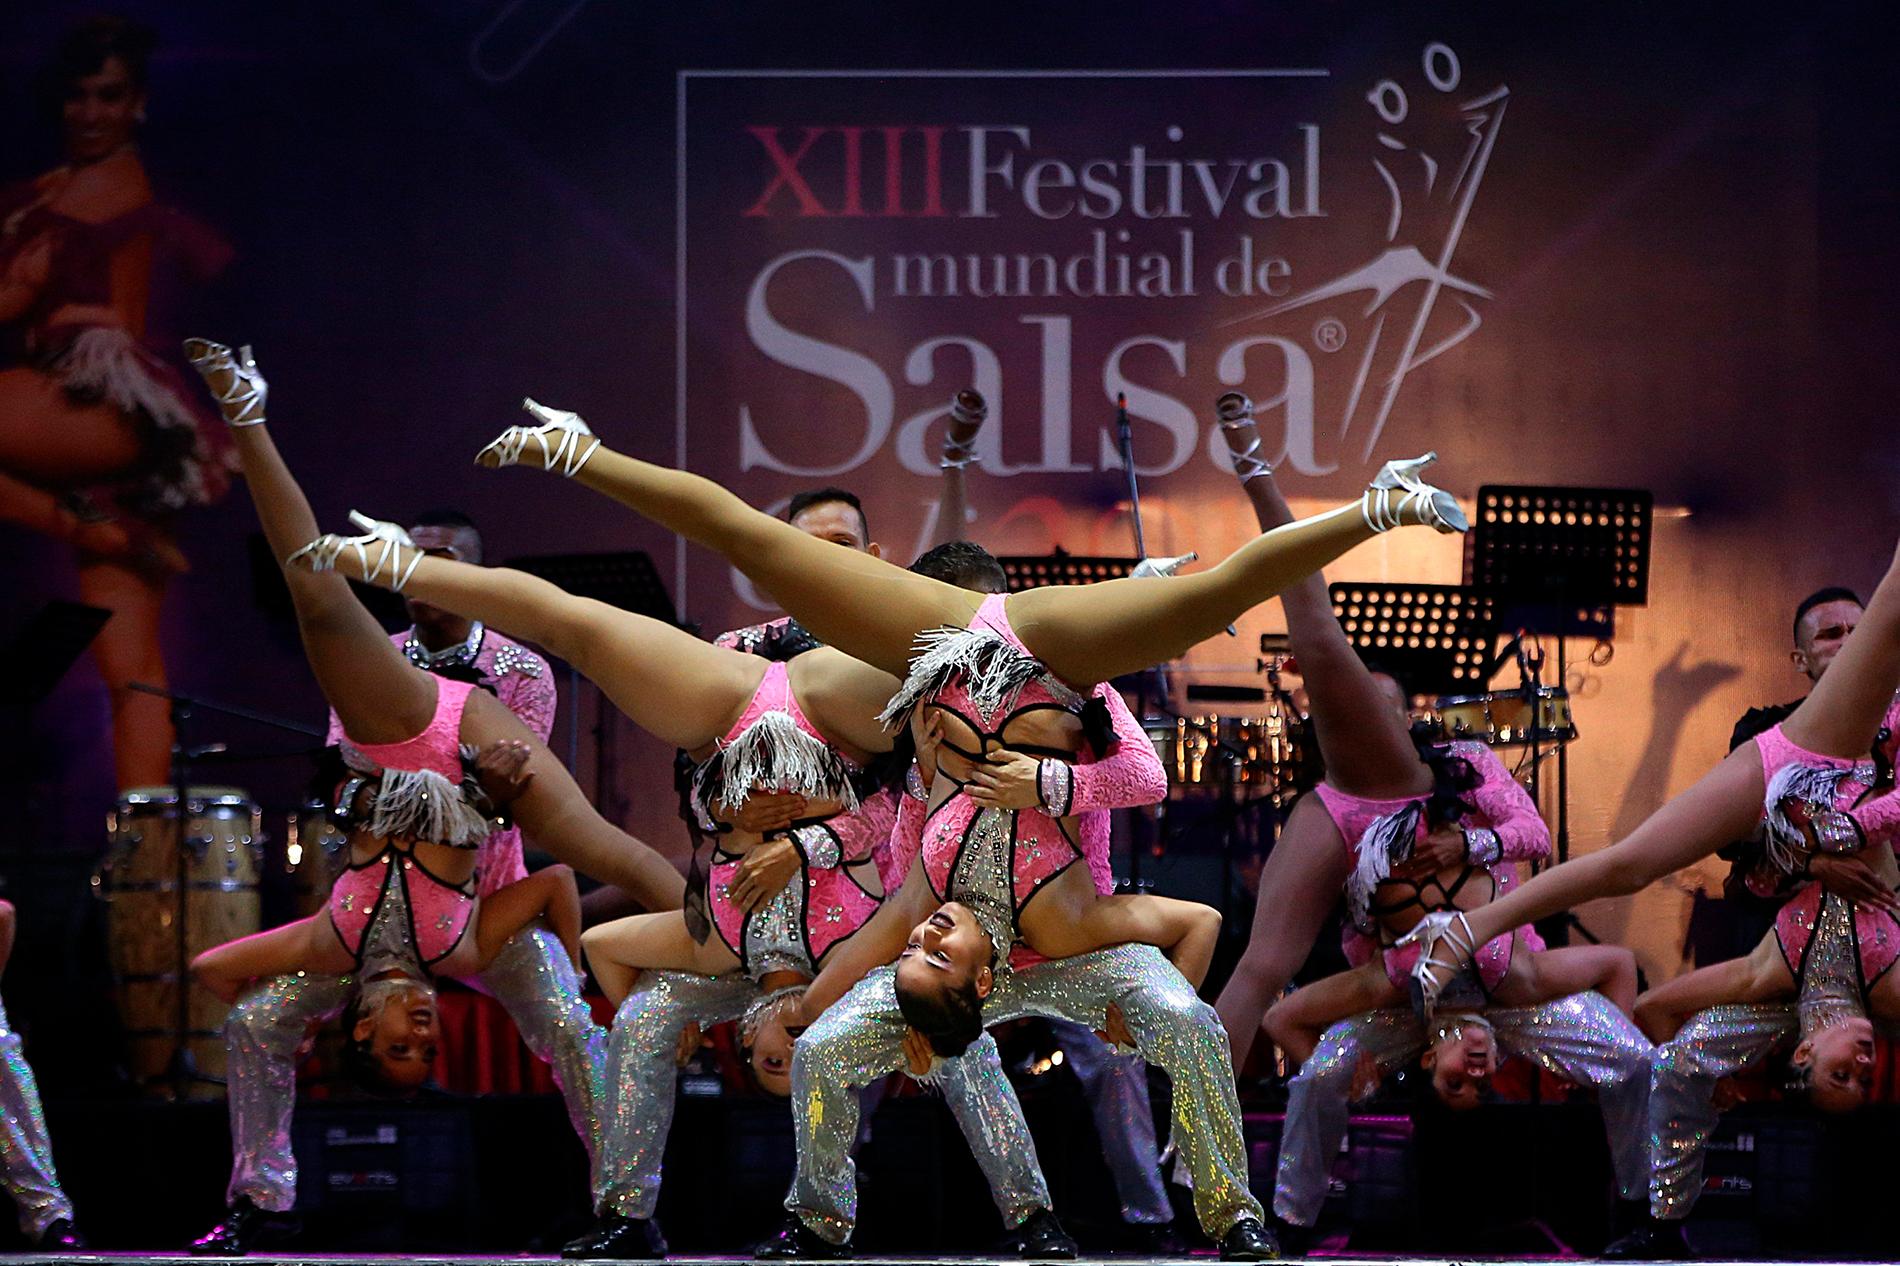 Festival Mundial de Salsa. Foto: colombiano24.com